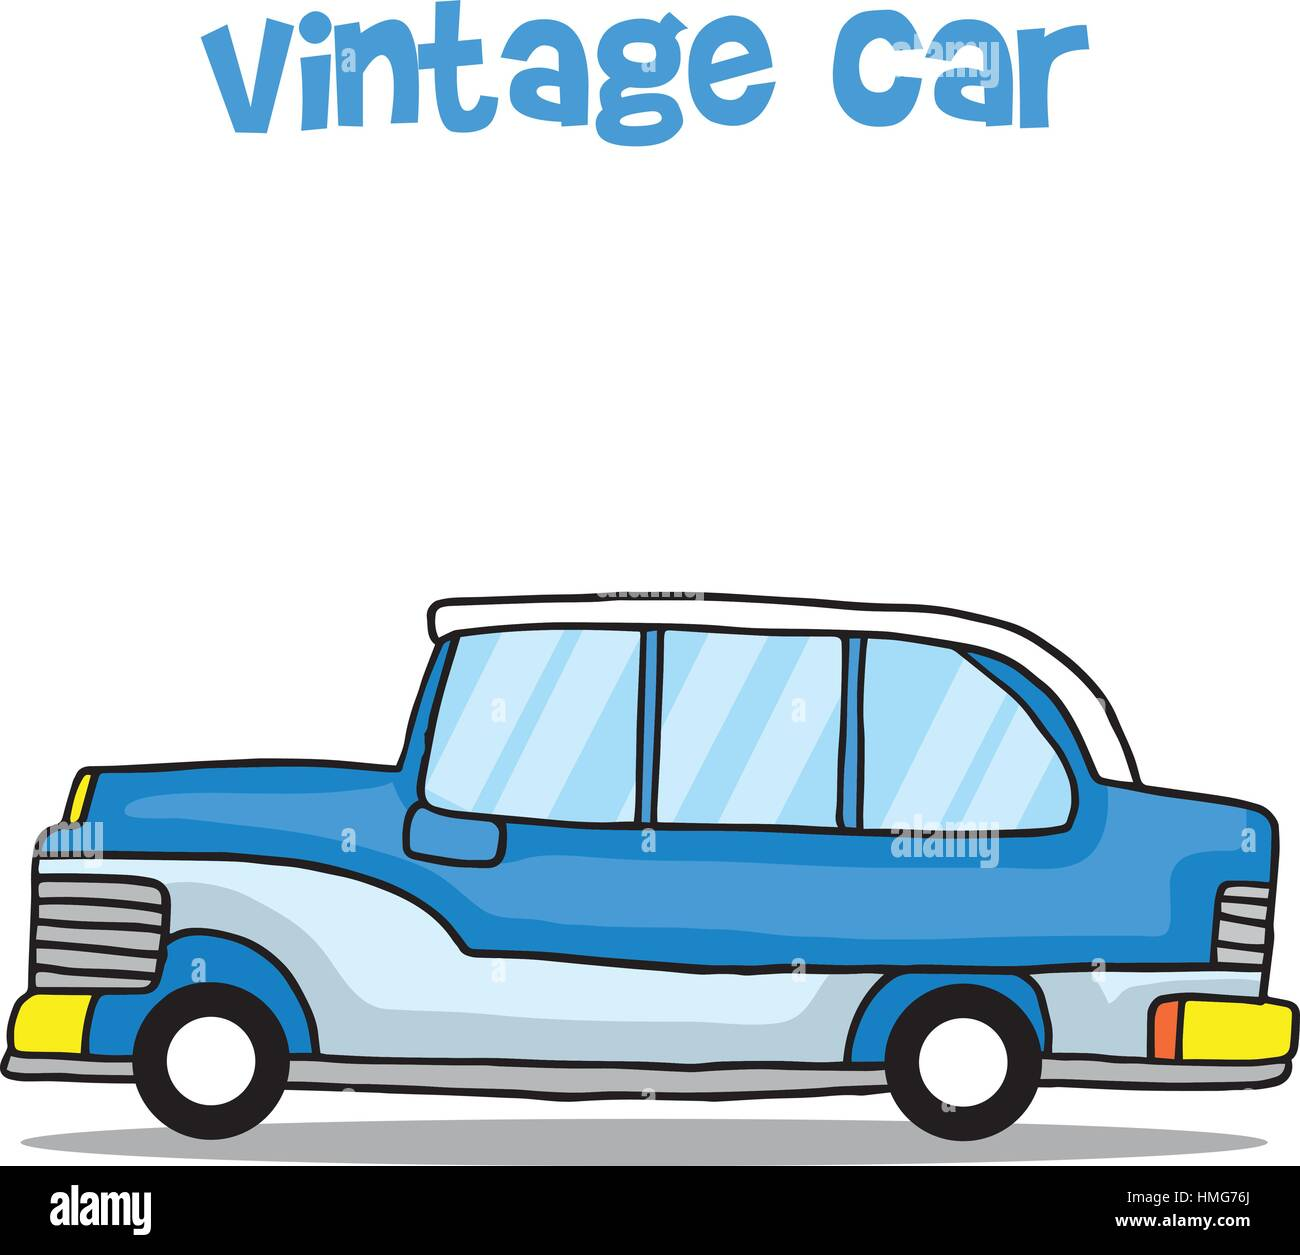 Vintage car cartoon education for kids - Stock Vector